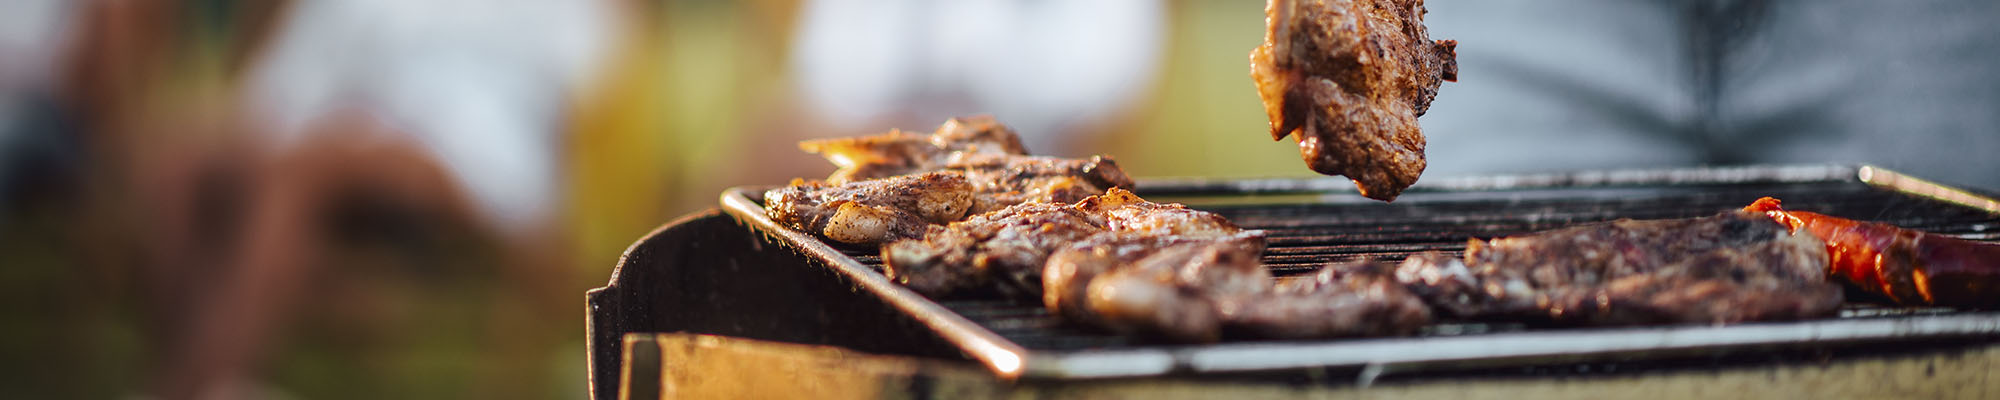 En grillbild ute i naturen. Kött ligger på en grill.